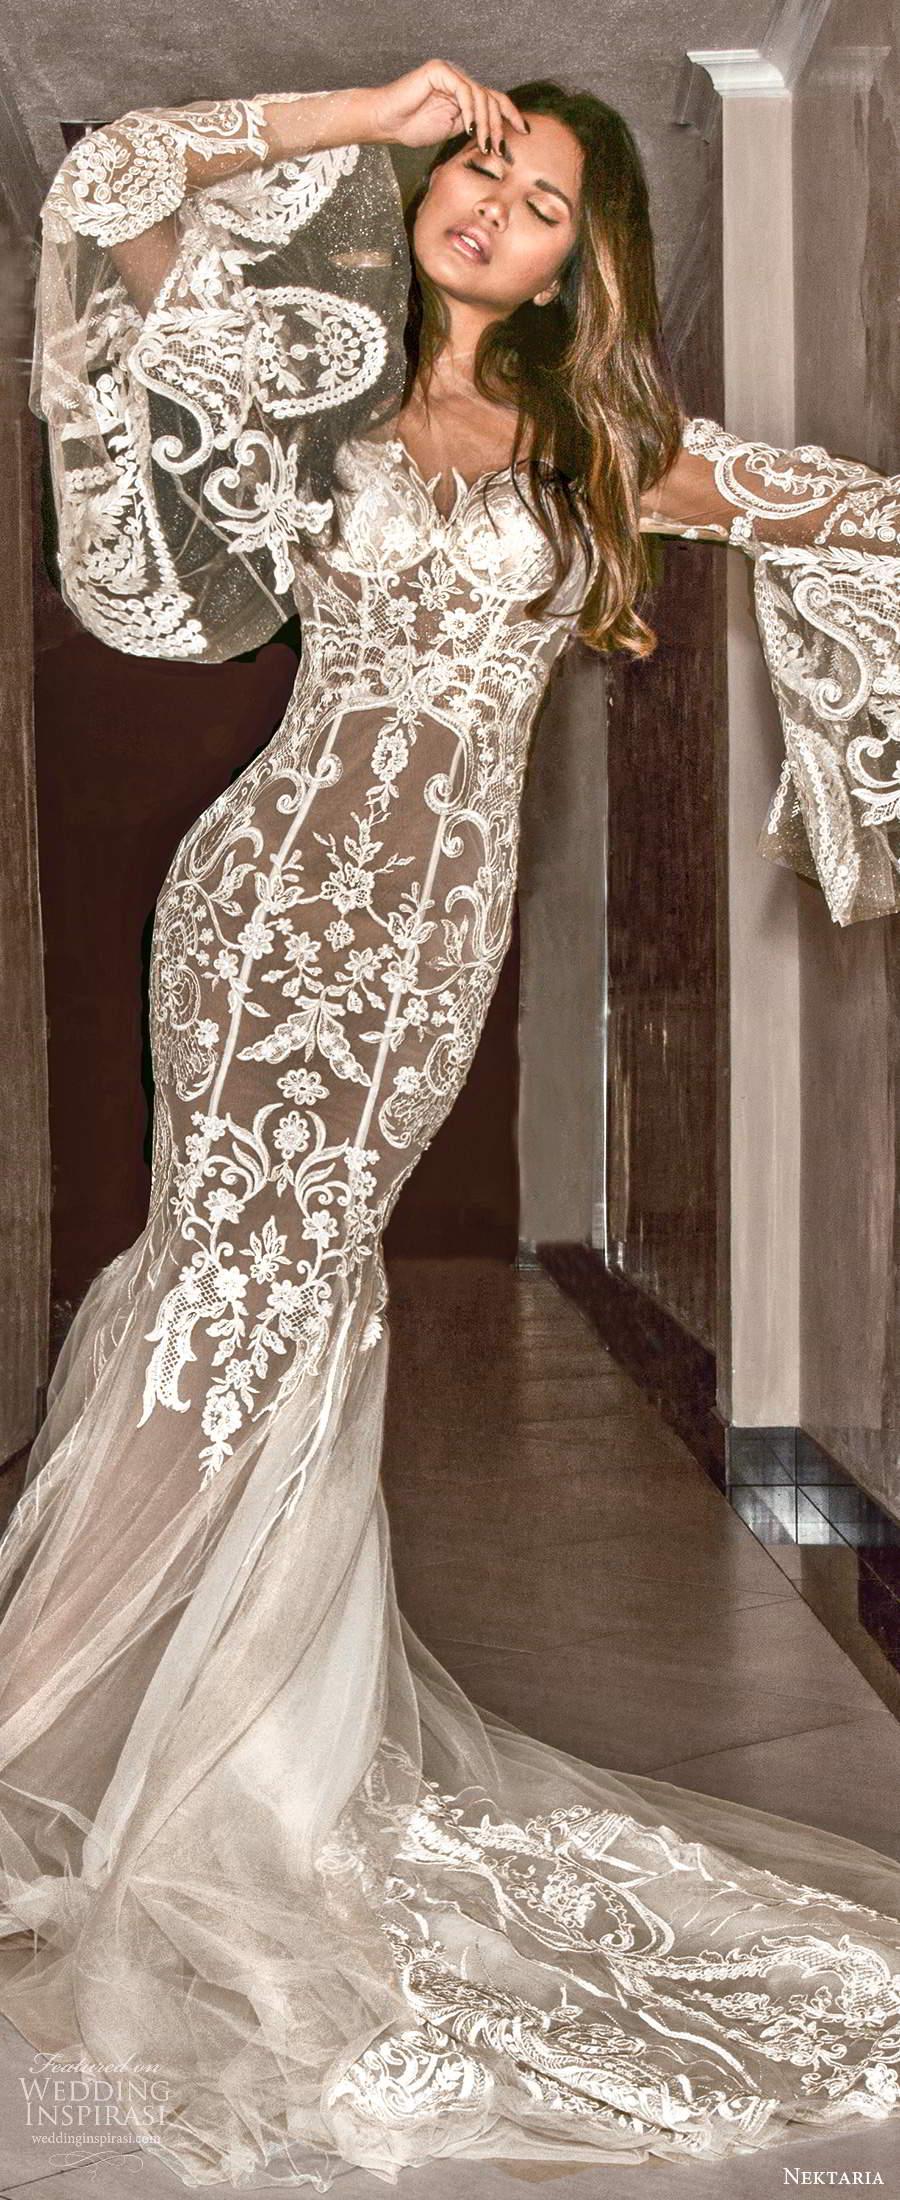 nektaria 2020 bridal long flare sleeves sweetheart neckline fit flare mermaid wedding dress chapel train (1) lv